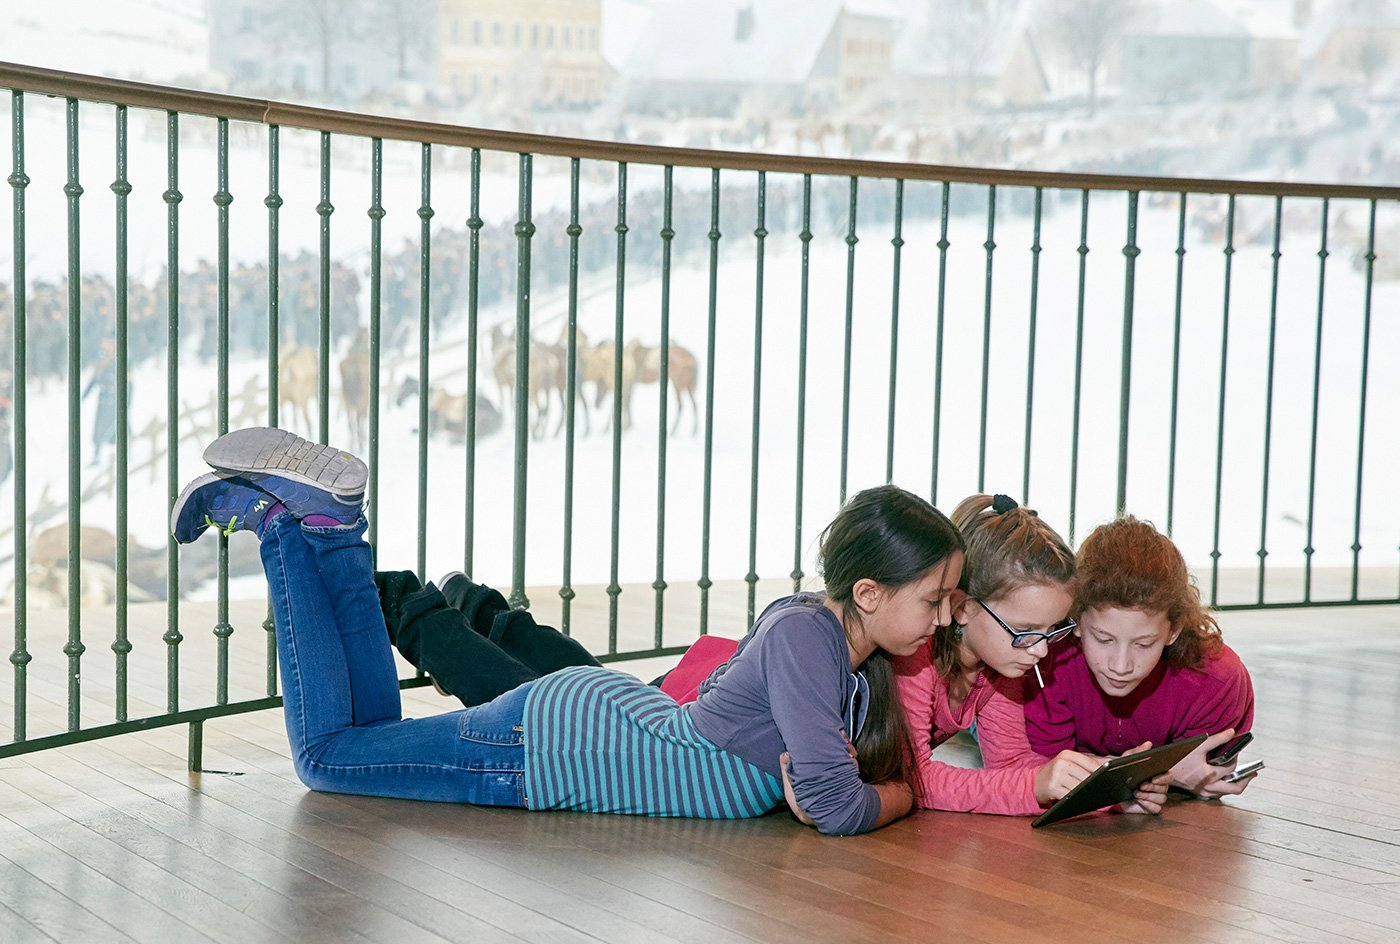 Gern gesehene Gäste: Kinder mit Tablet vor dem Rundbild im Bourbaki-Panorama.